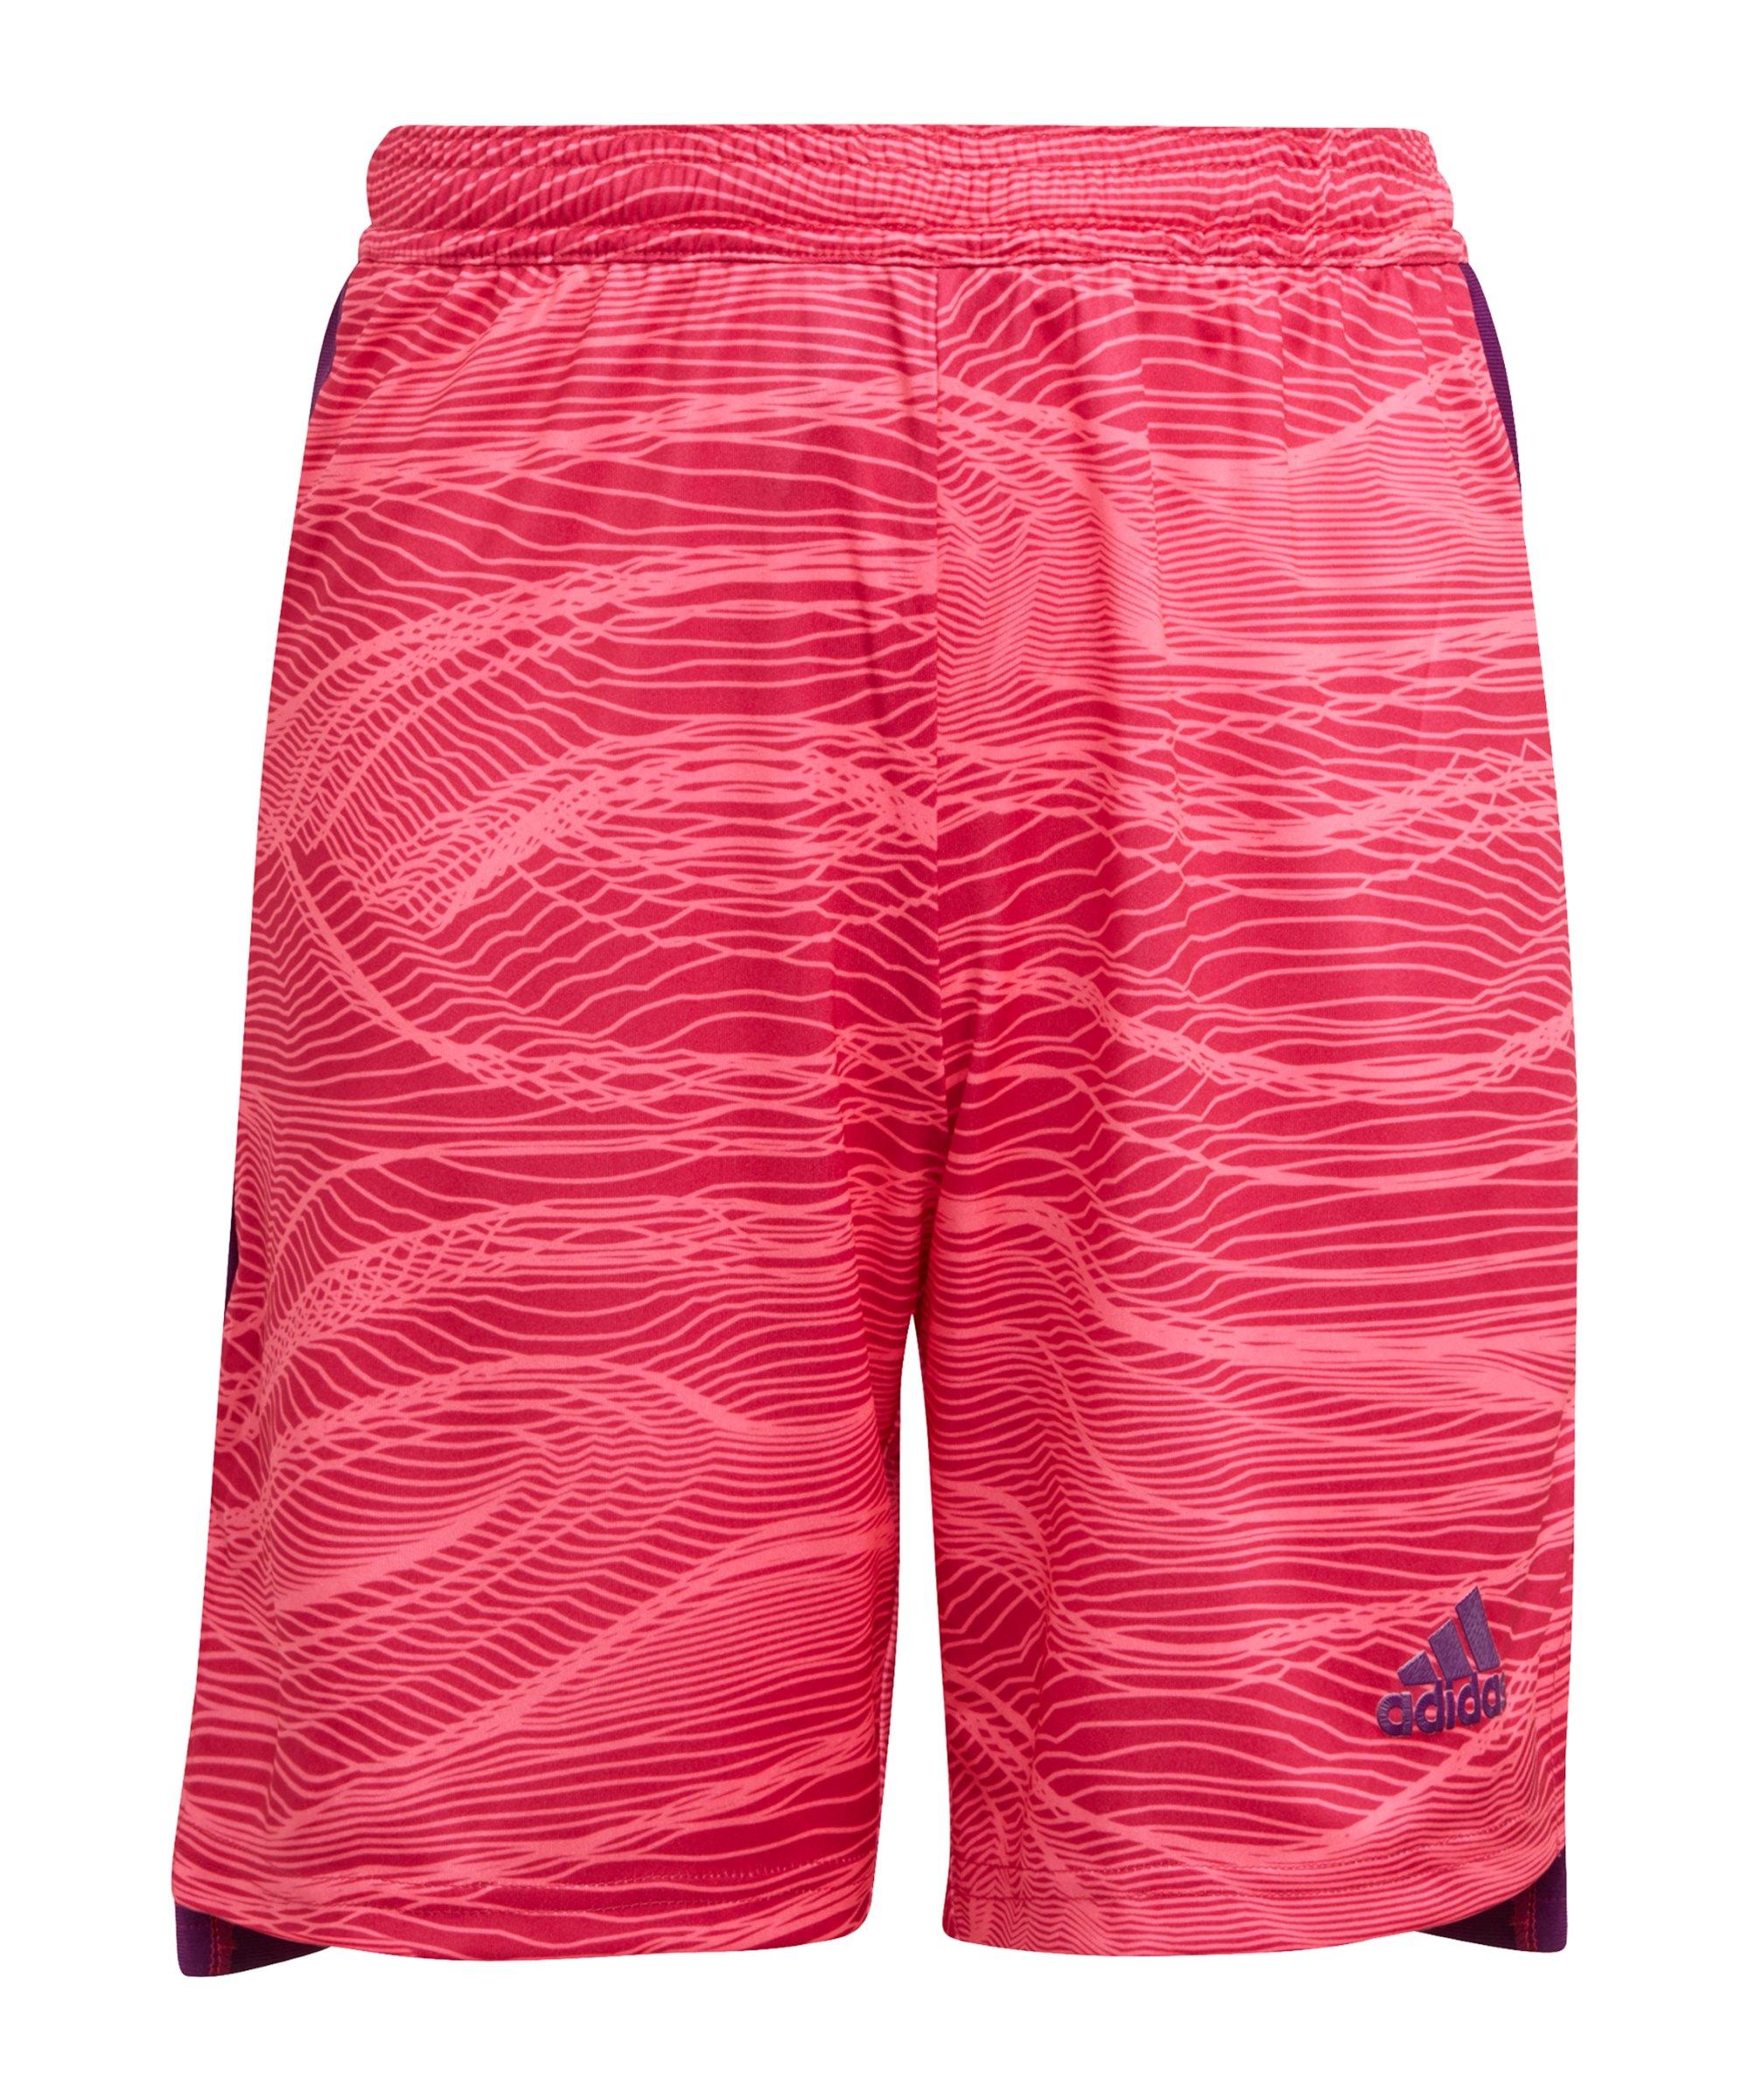 adidas Condivo 21 Torwartshort Kids Pink - pink